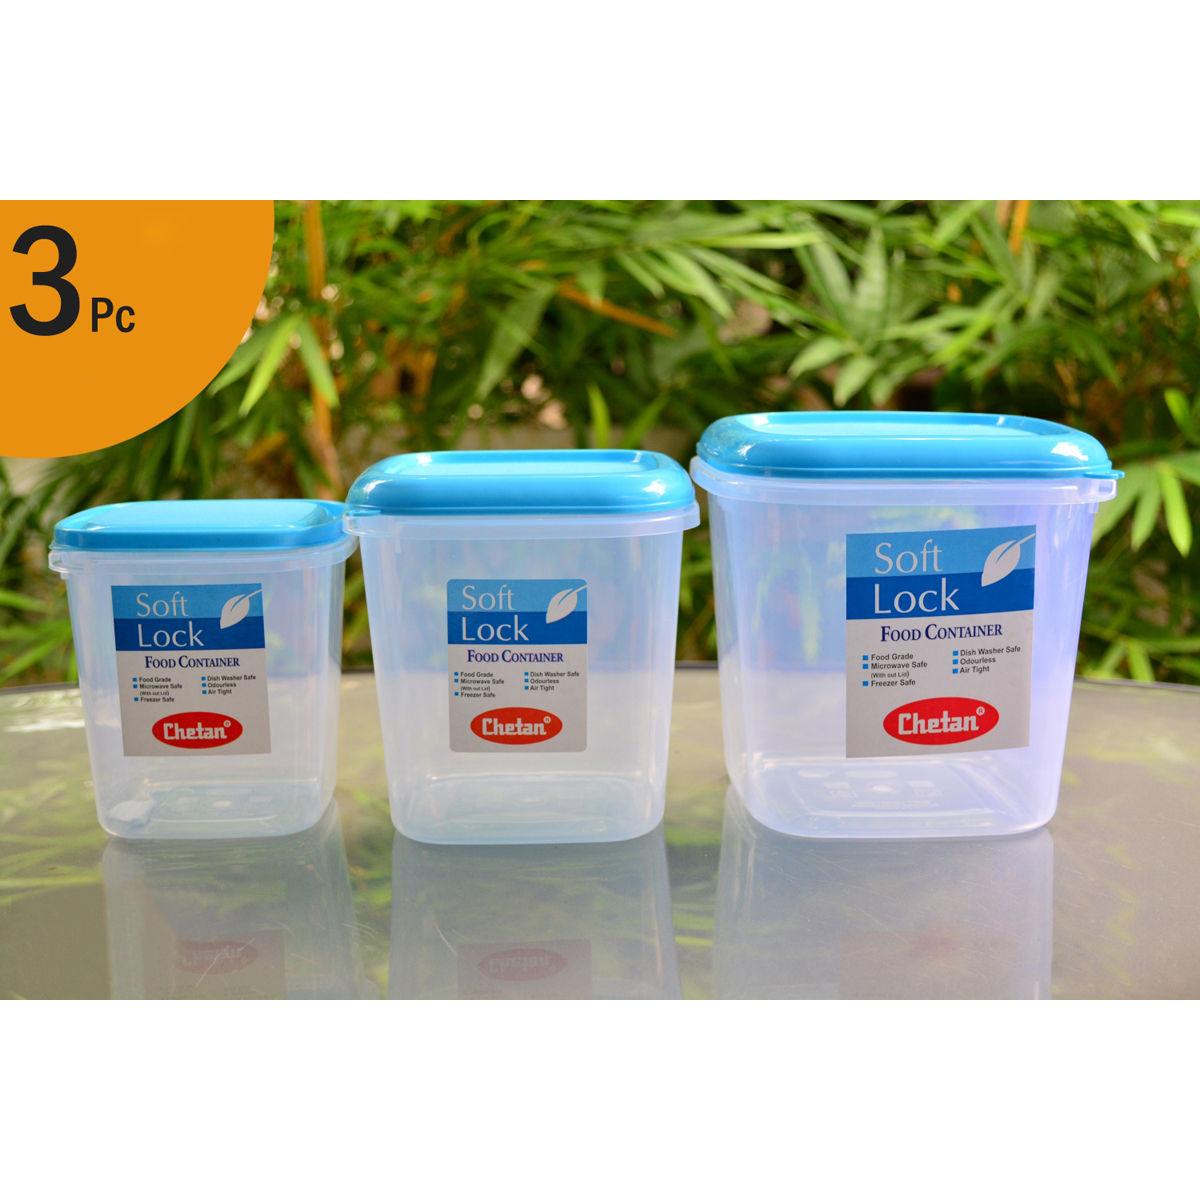 Kitchen plastic storage containers Photo - 11 | Kitchen ideas